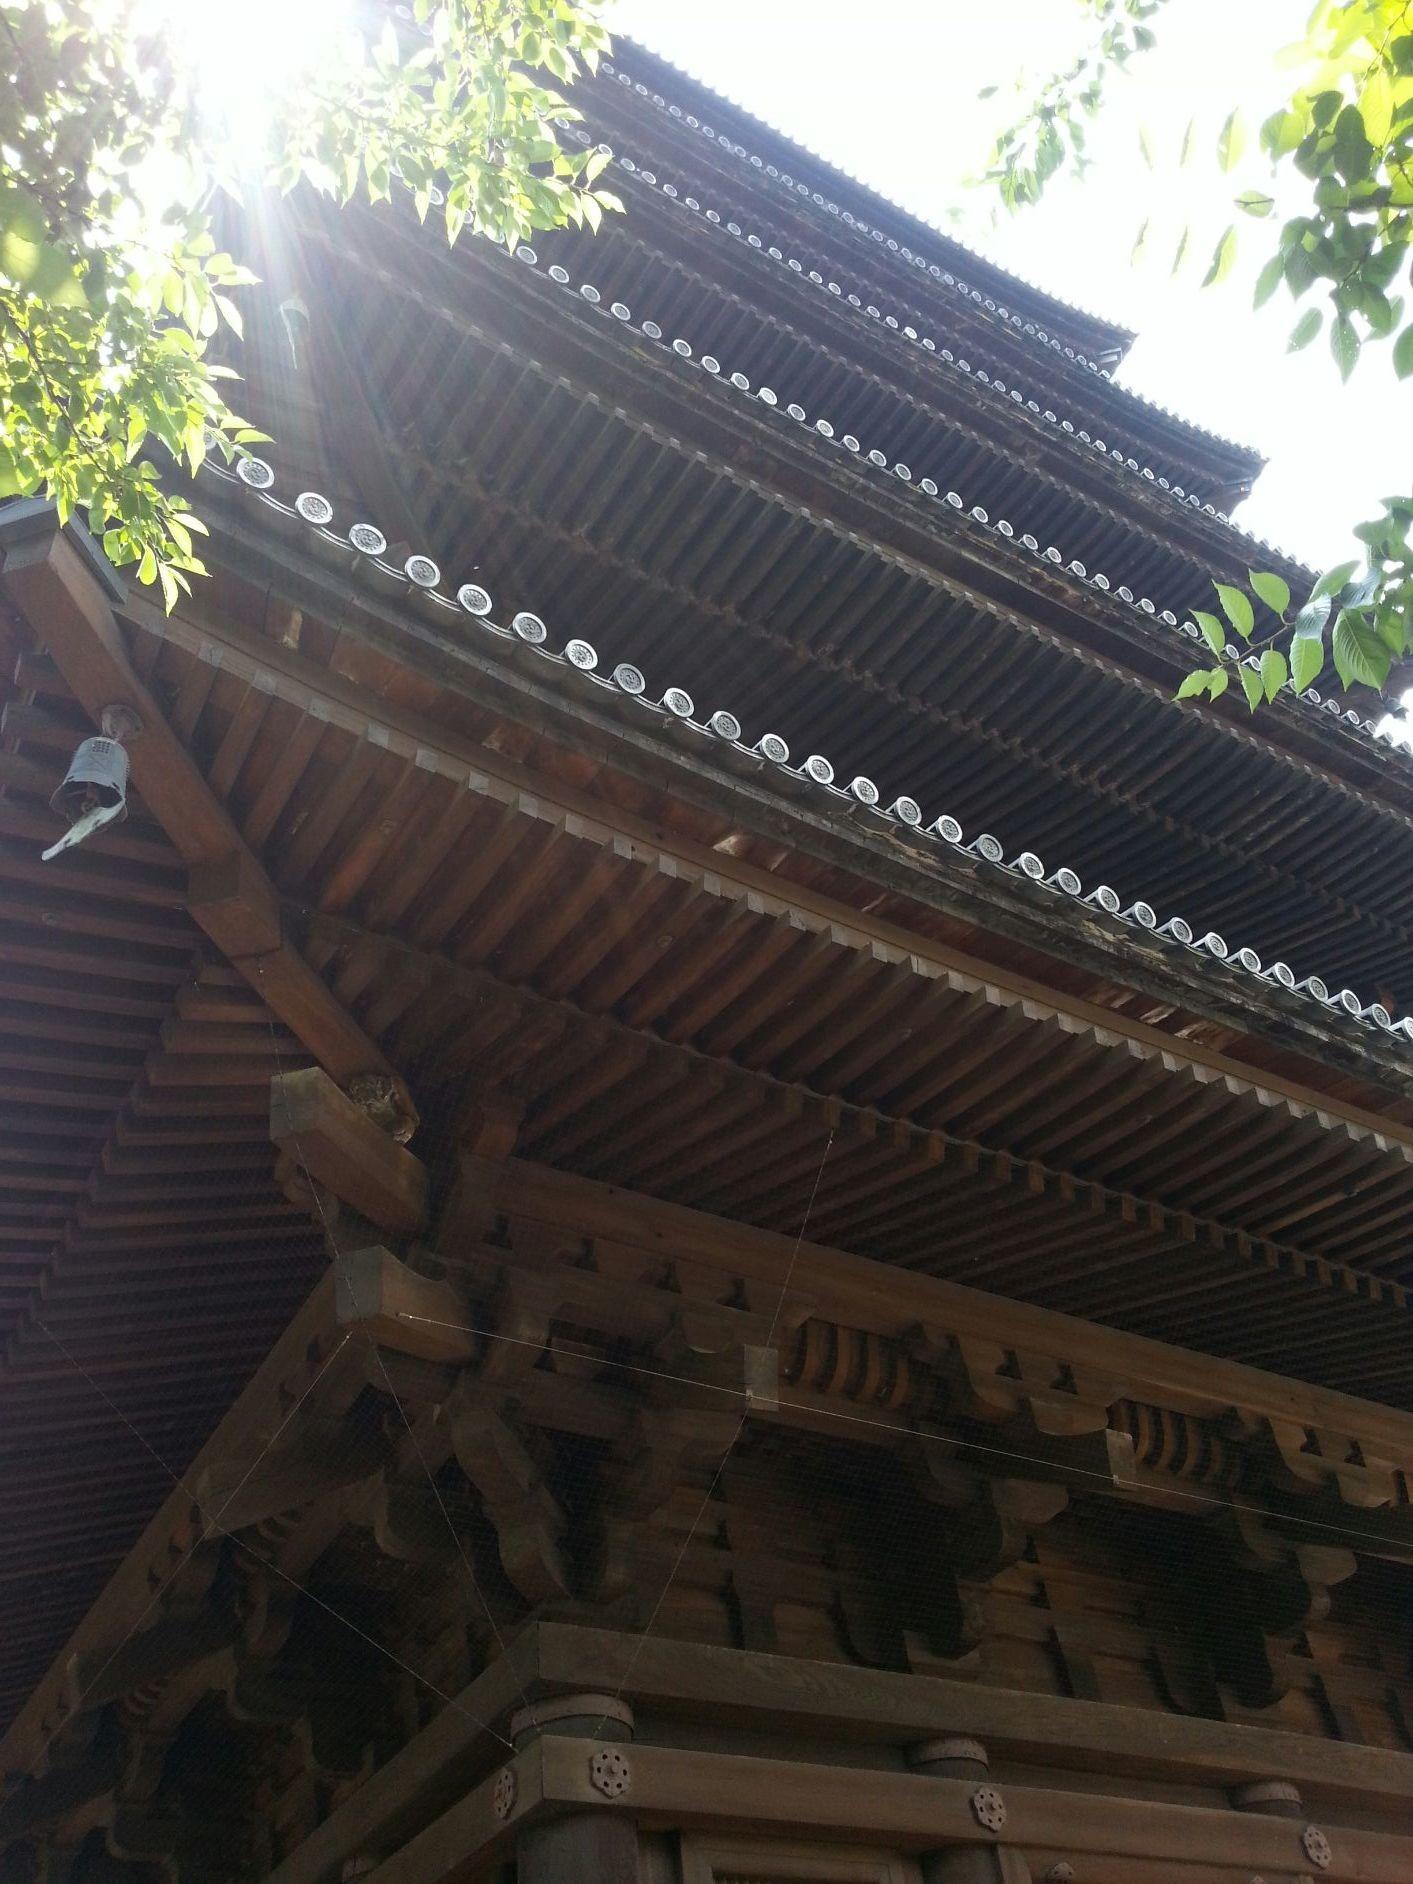 Summer in Kyoto - Touji Pagoda.